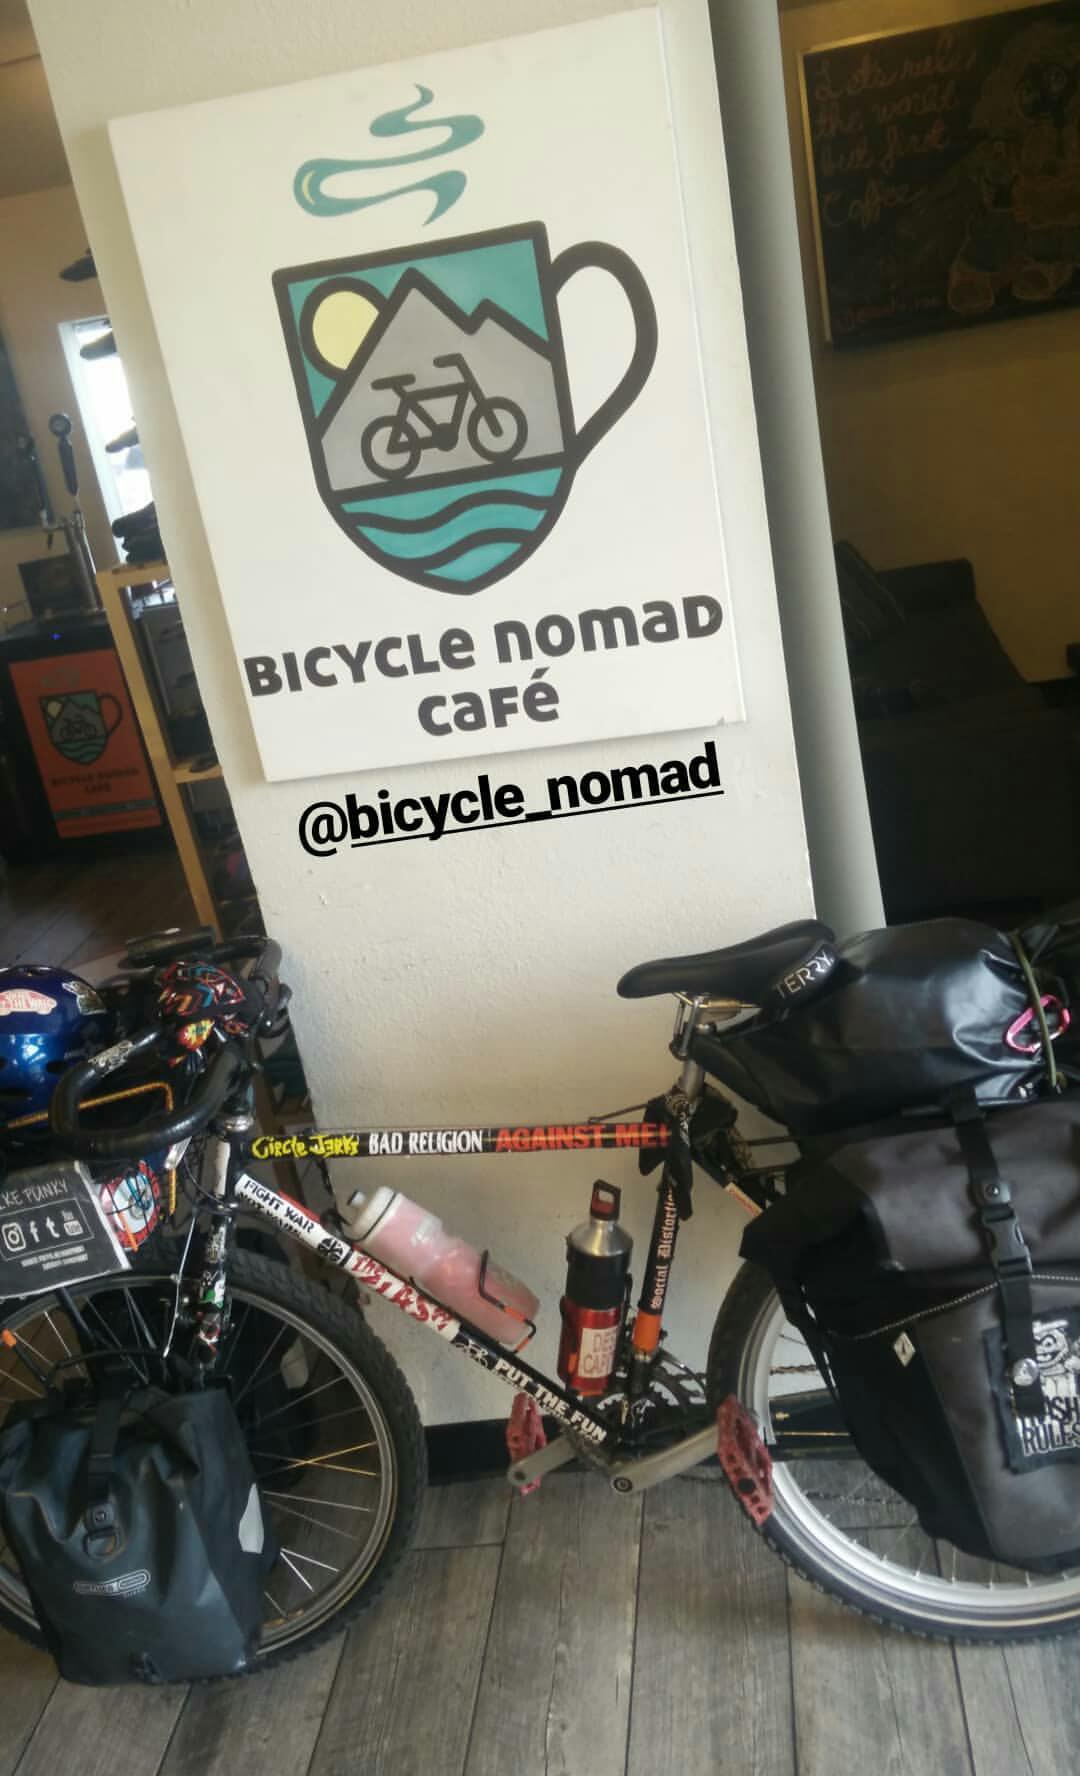 img_20190130_133636_140-jpg.48884_FIRST EVER BIKE TOUR (PICS)_Bike Touring_Squat the Planet_2:28 PM